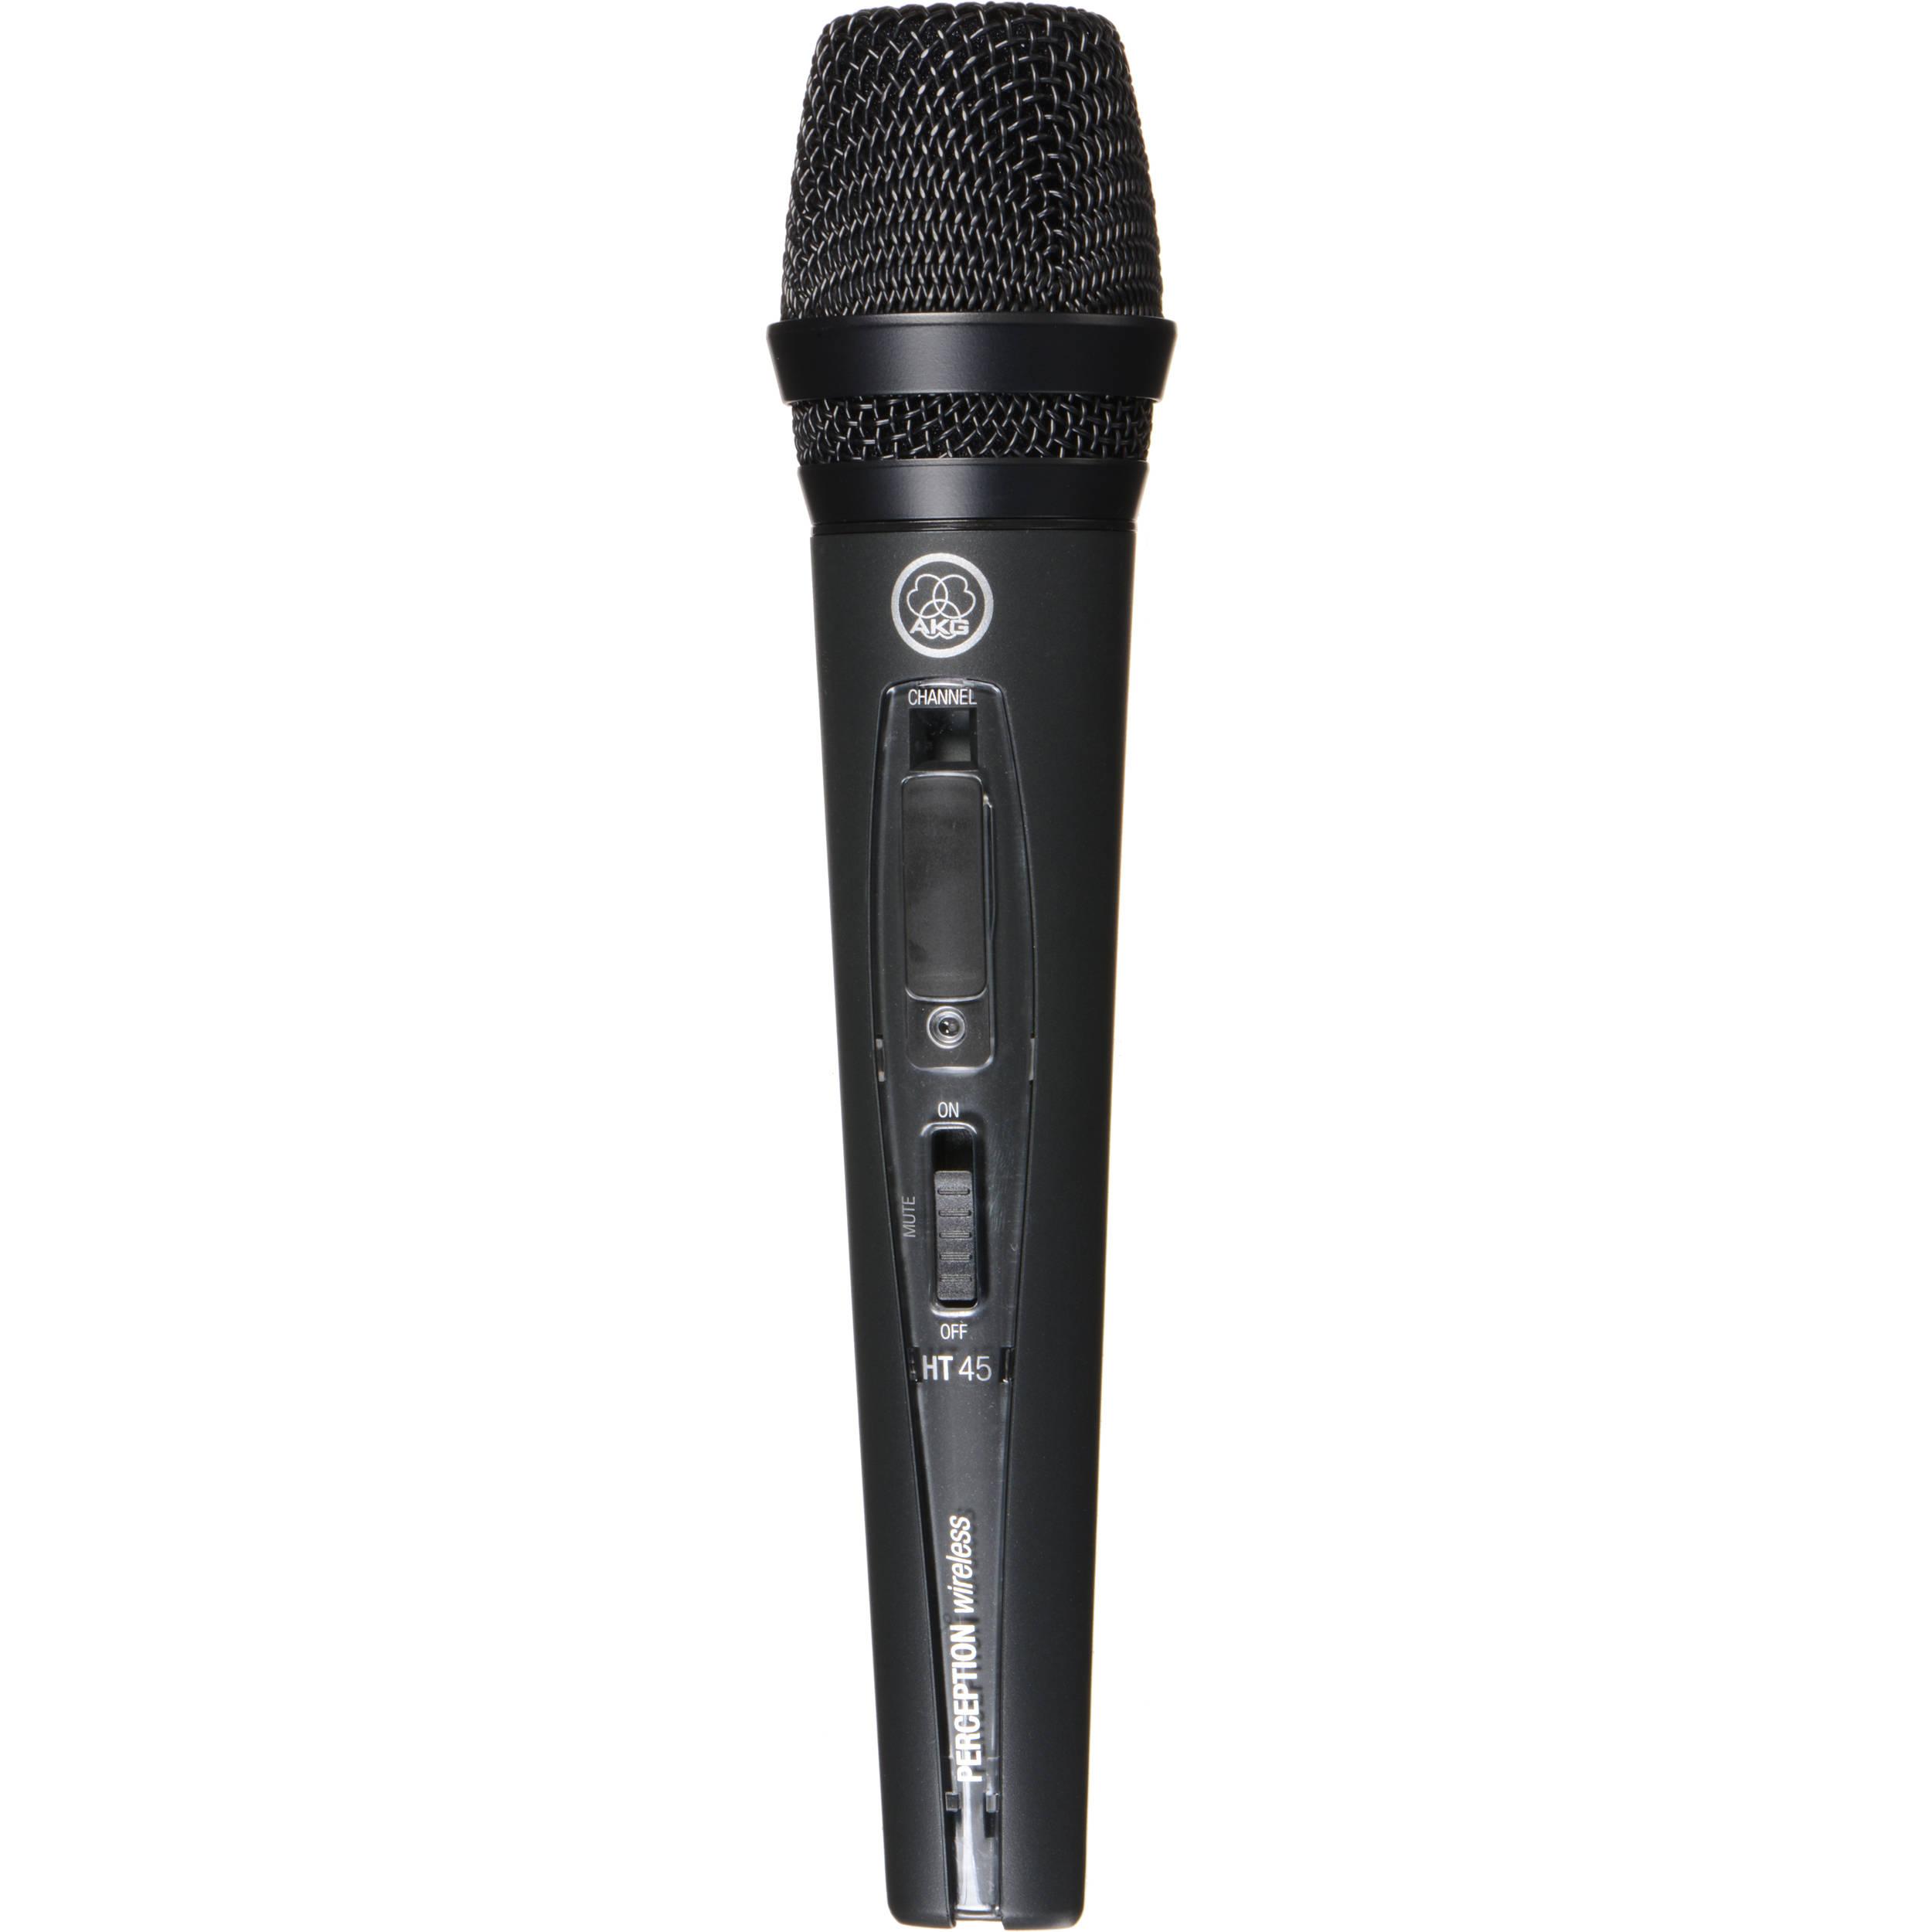 akg perception ht 45 handheld wireless microphone 3246h00010 b h. Black Bedroom Furniture Sets. Home Design Ideas